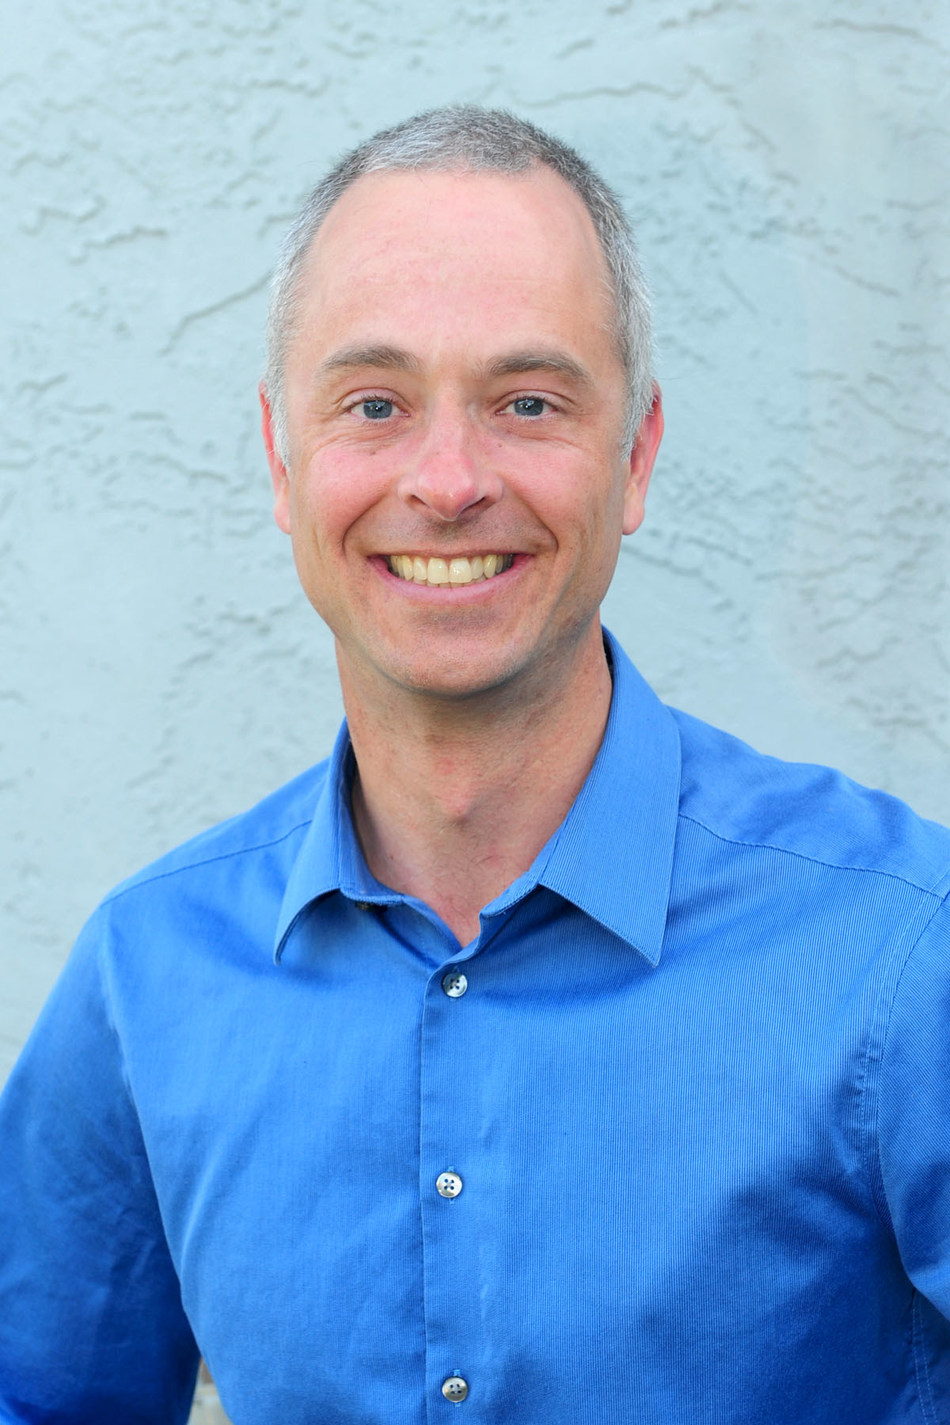 William P. Quinn, Chief Financial Officer of Bolt Biotherapeutics, Inc.